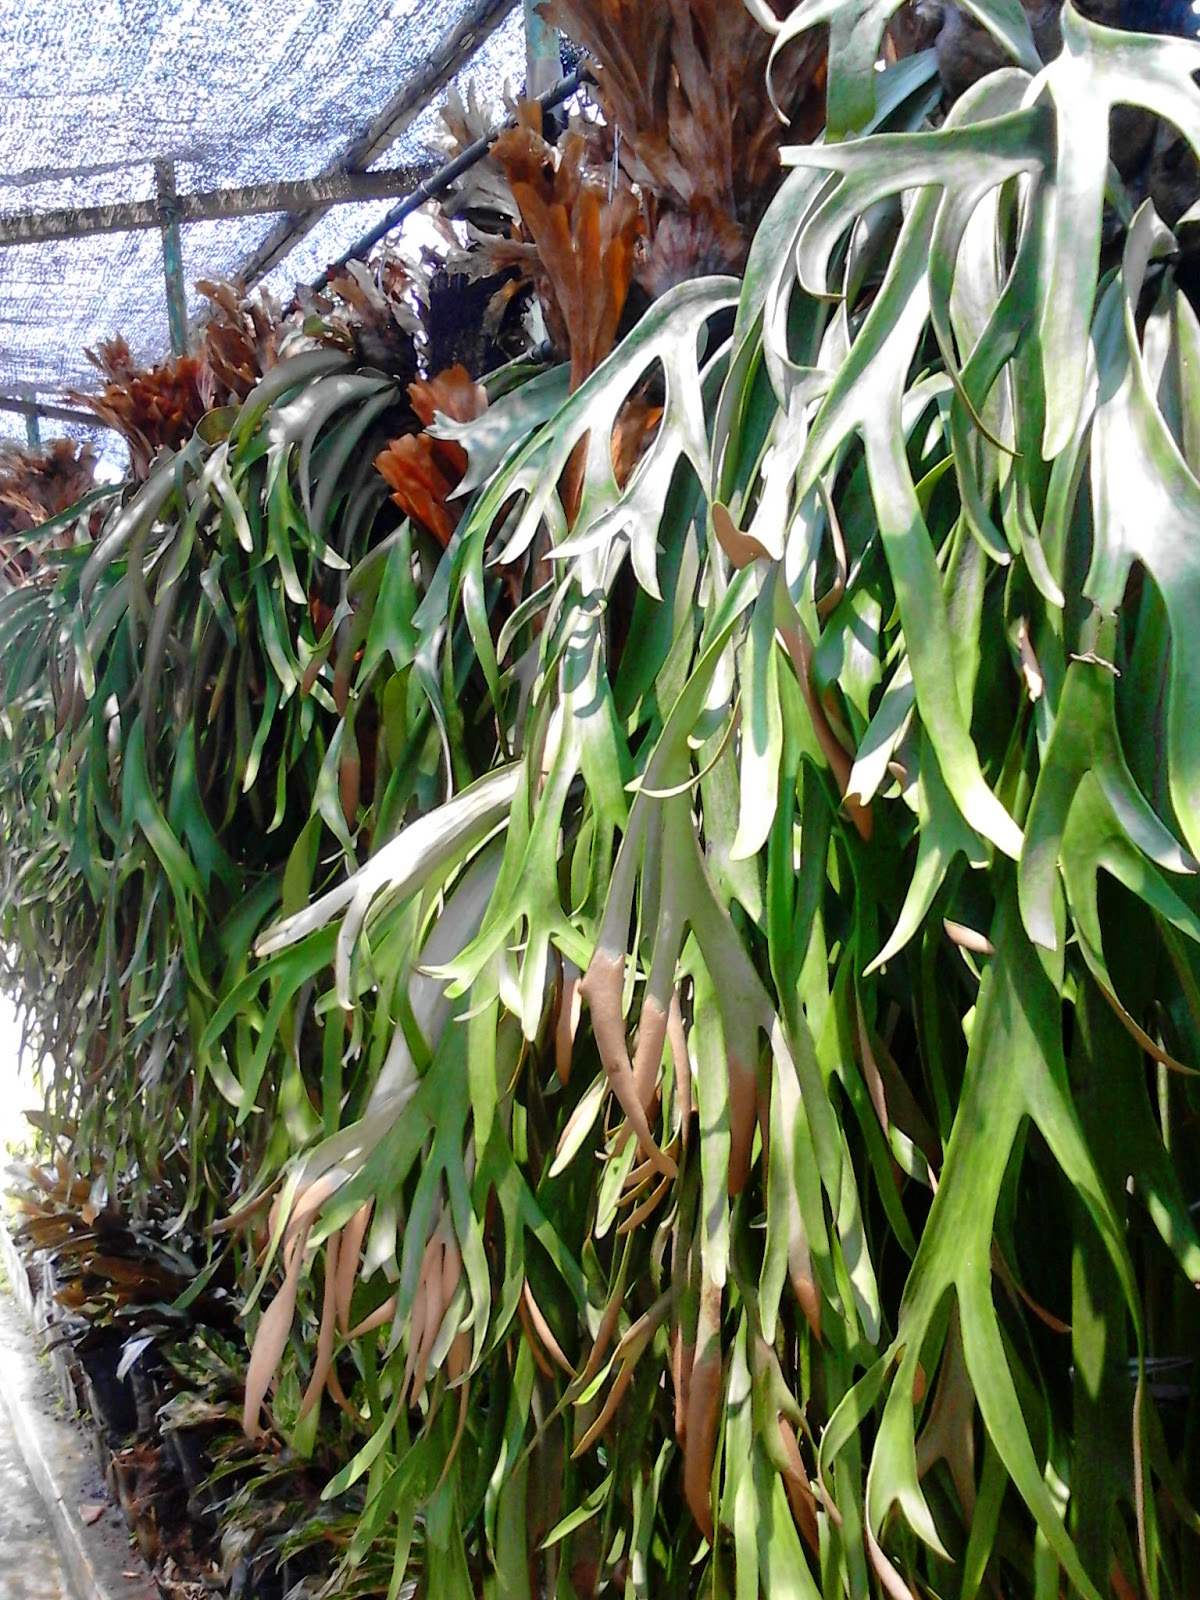 Jual Tanaman Tanduk Rusa | Jual Aneka Pohon Paku | Jual Tanaman Online